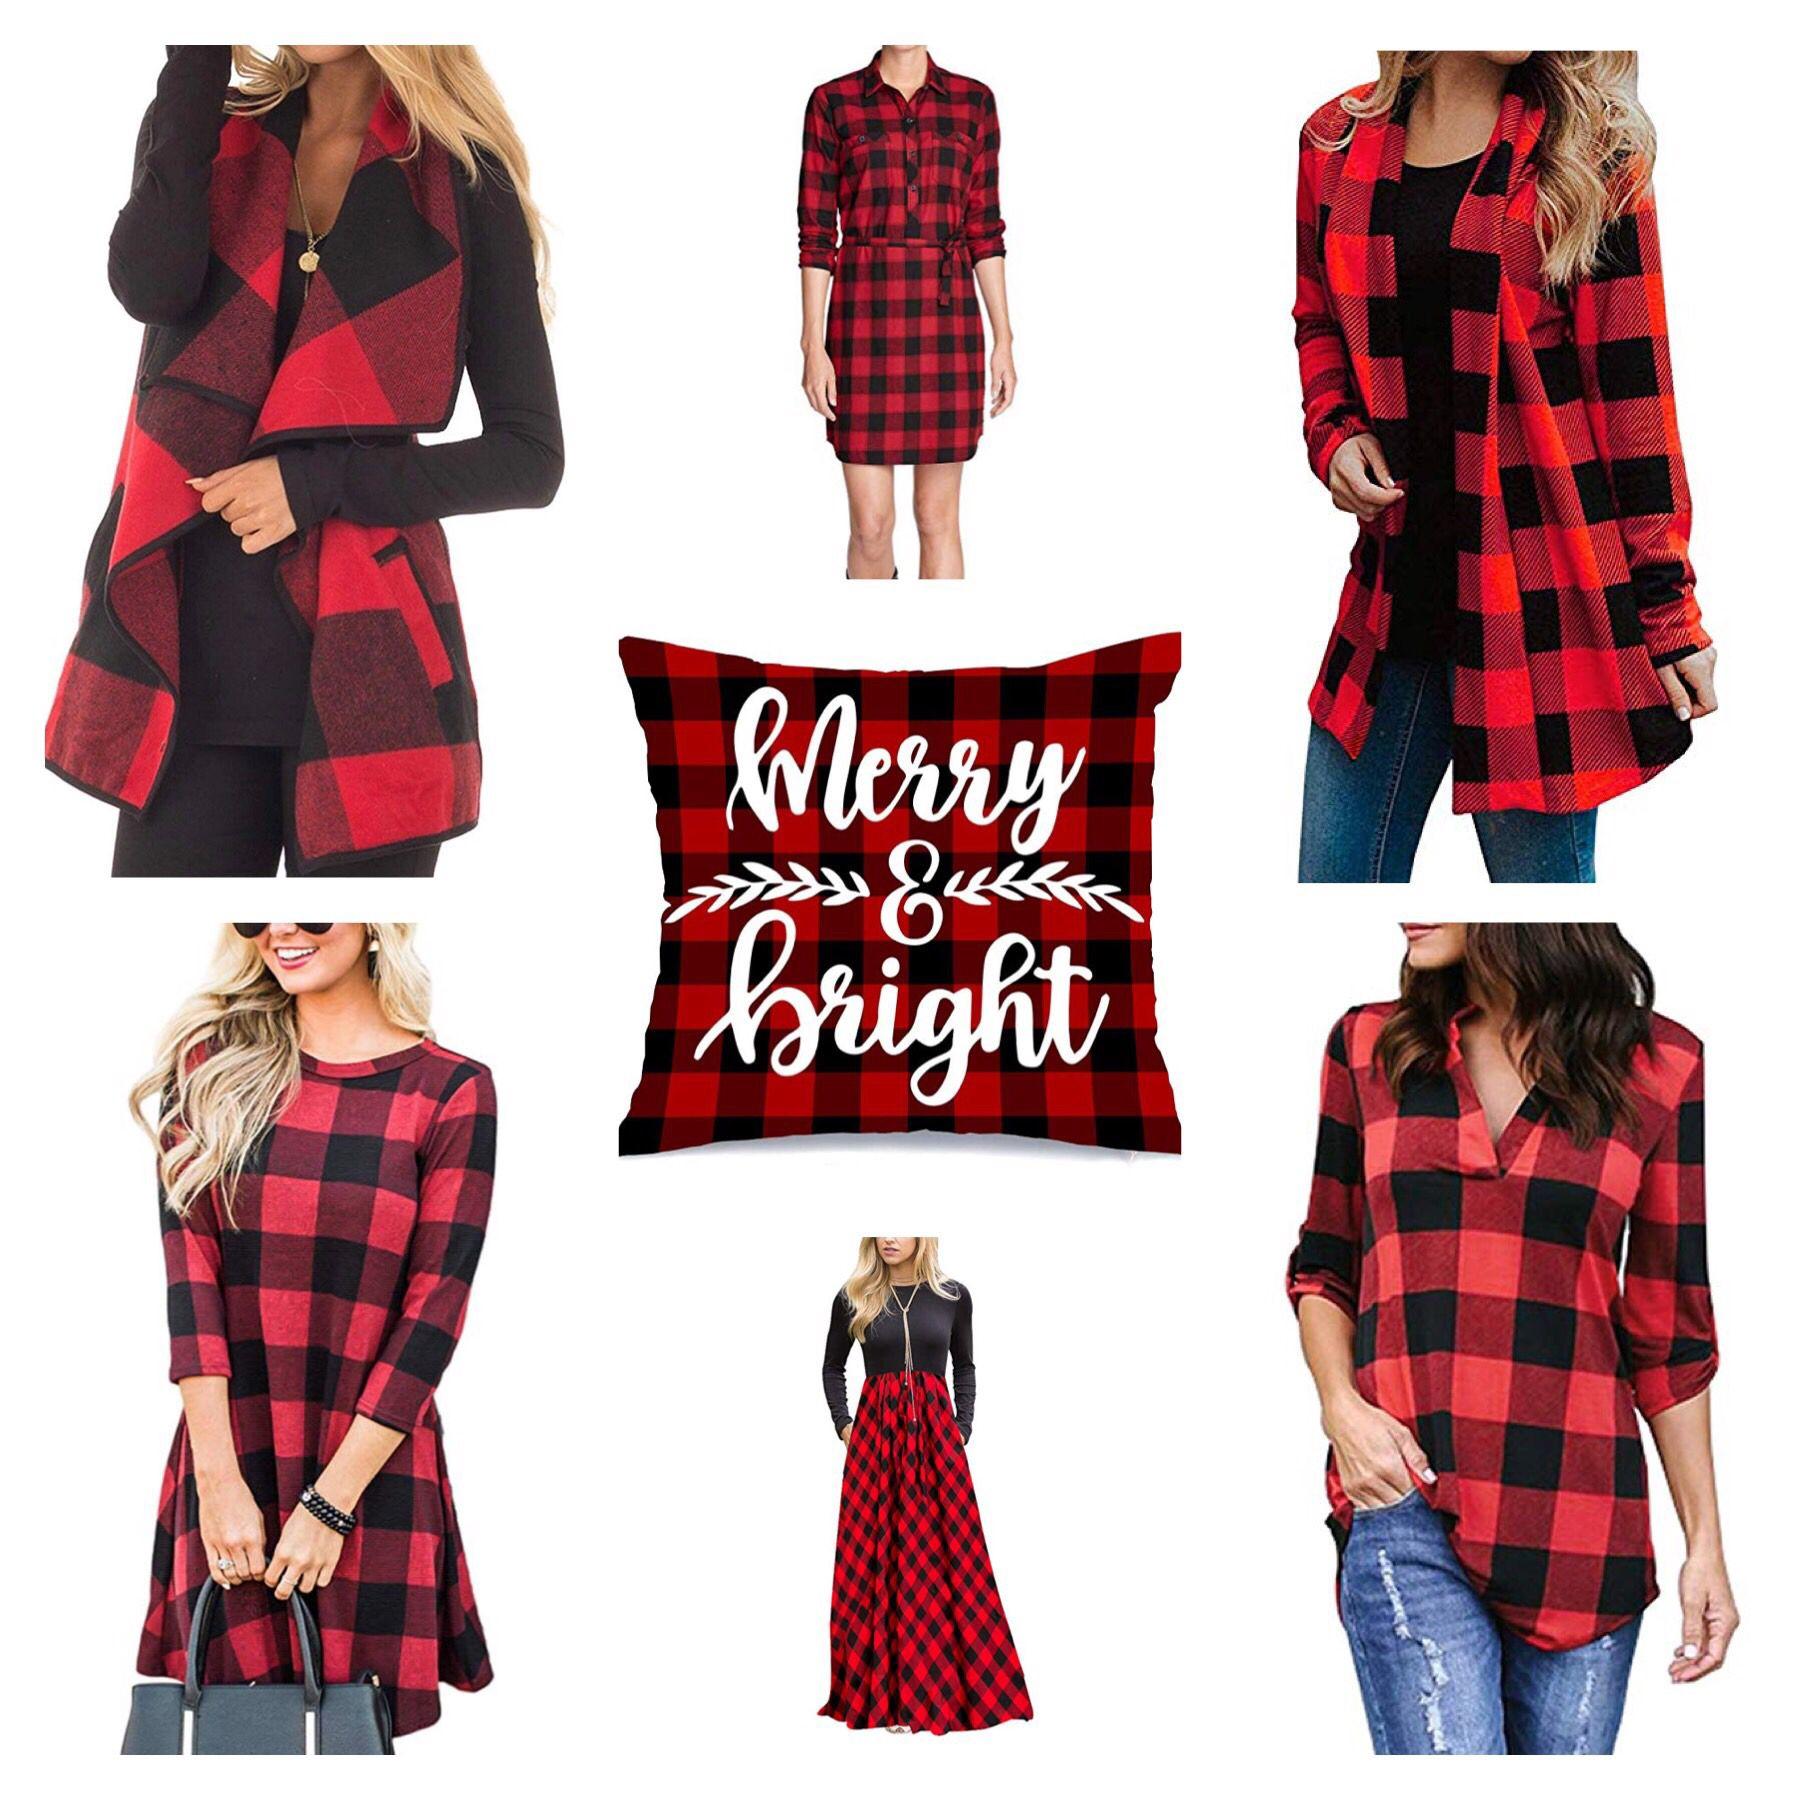 Curated Shopping list with ideas for home, clothing, accessories, gifts, and more in red plaid patterns! #plaid #plaidshirt #plaidpants #plaidblazer #plaiddress #plaidchristmas #plaidwrappingpaper #plaidgifts #redplaid #buffaloplaid #buffalocheck #tartan #tartanplaid #womensfashion #mensfashion #homedecor #gifts